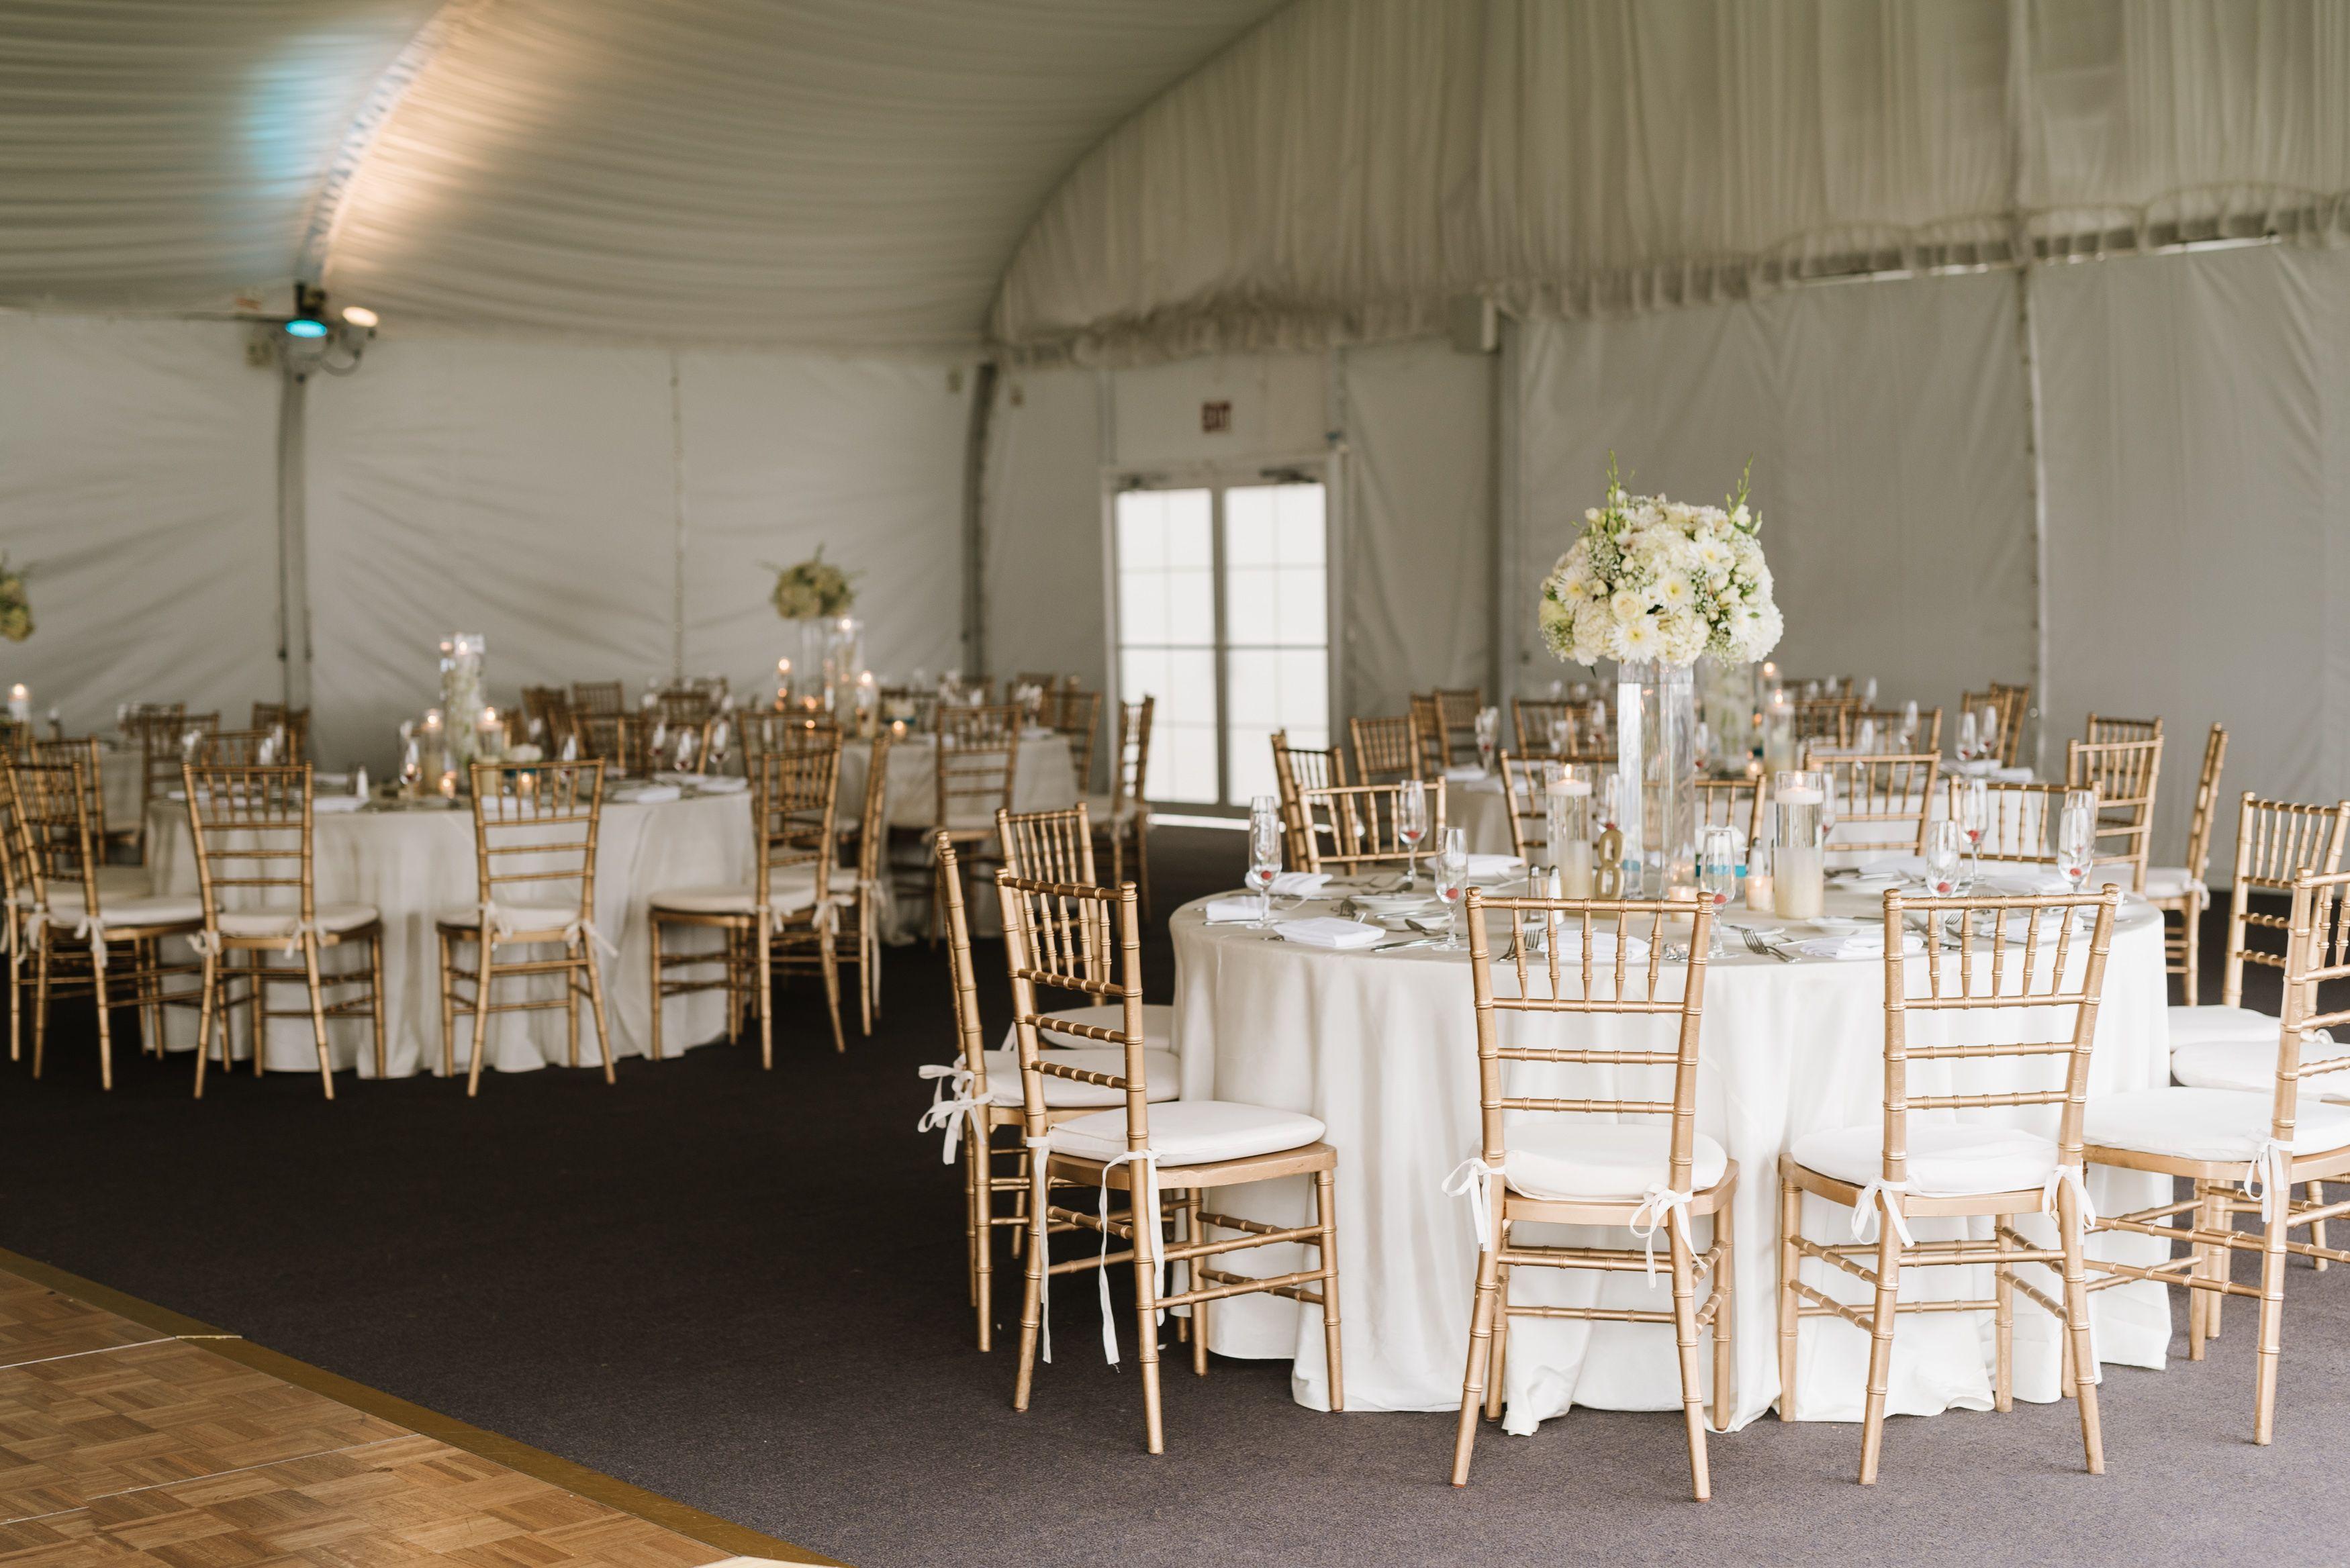 Hyatt Regency Boston Harbor Wedding Reception Picture Credit: AnnMarie  Swift Photography annmarieswift.com